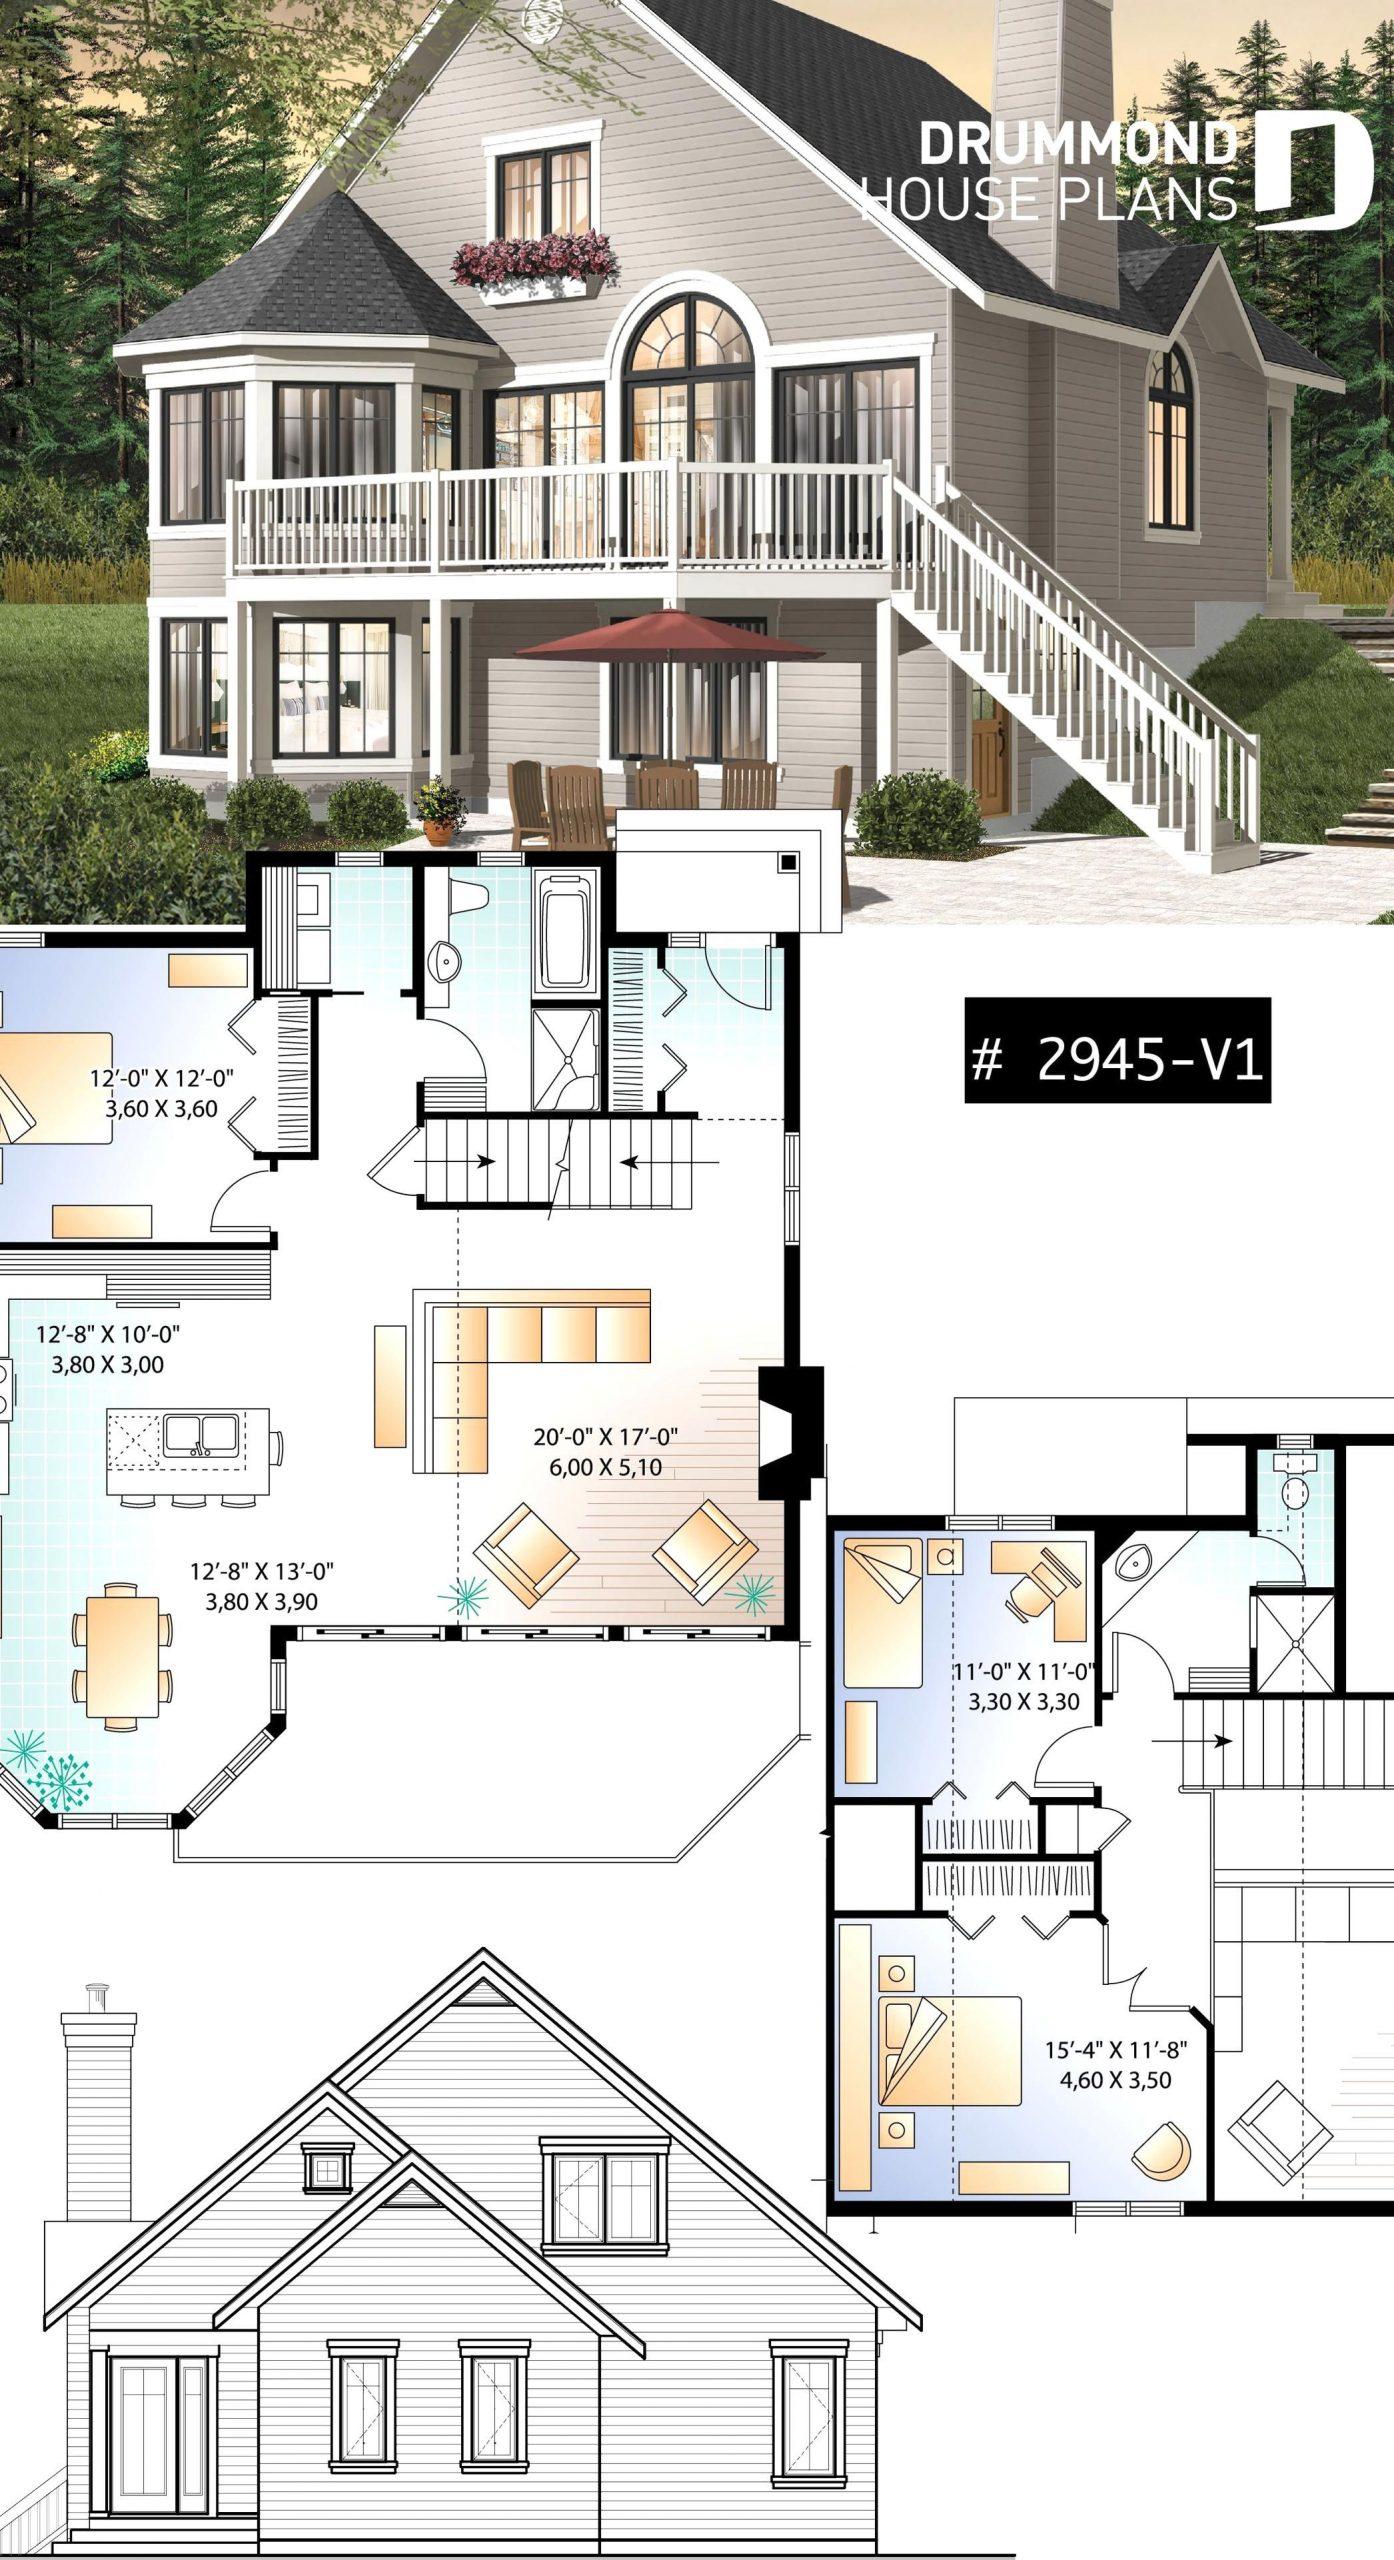 Popular 3 Bedroom Chalet With Mezzanine And Convivial Floor ... destiné Plan Chalet 18 20